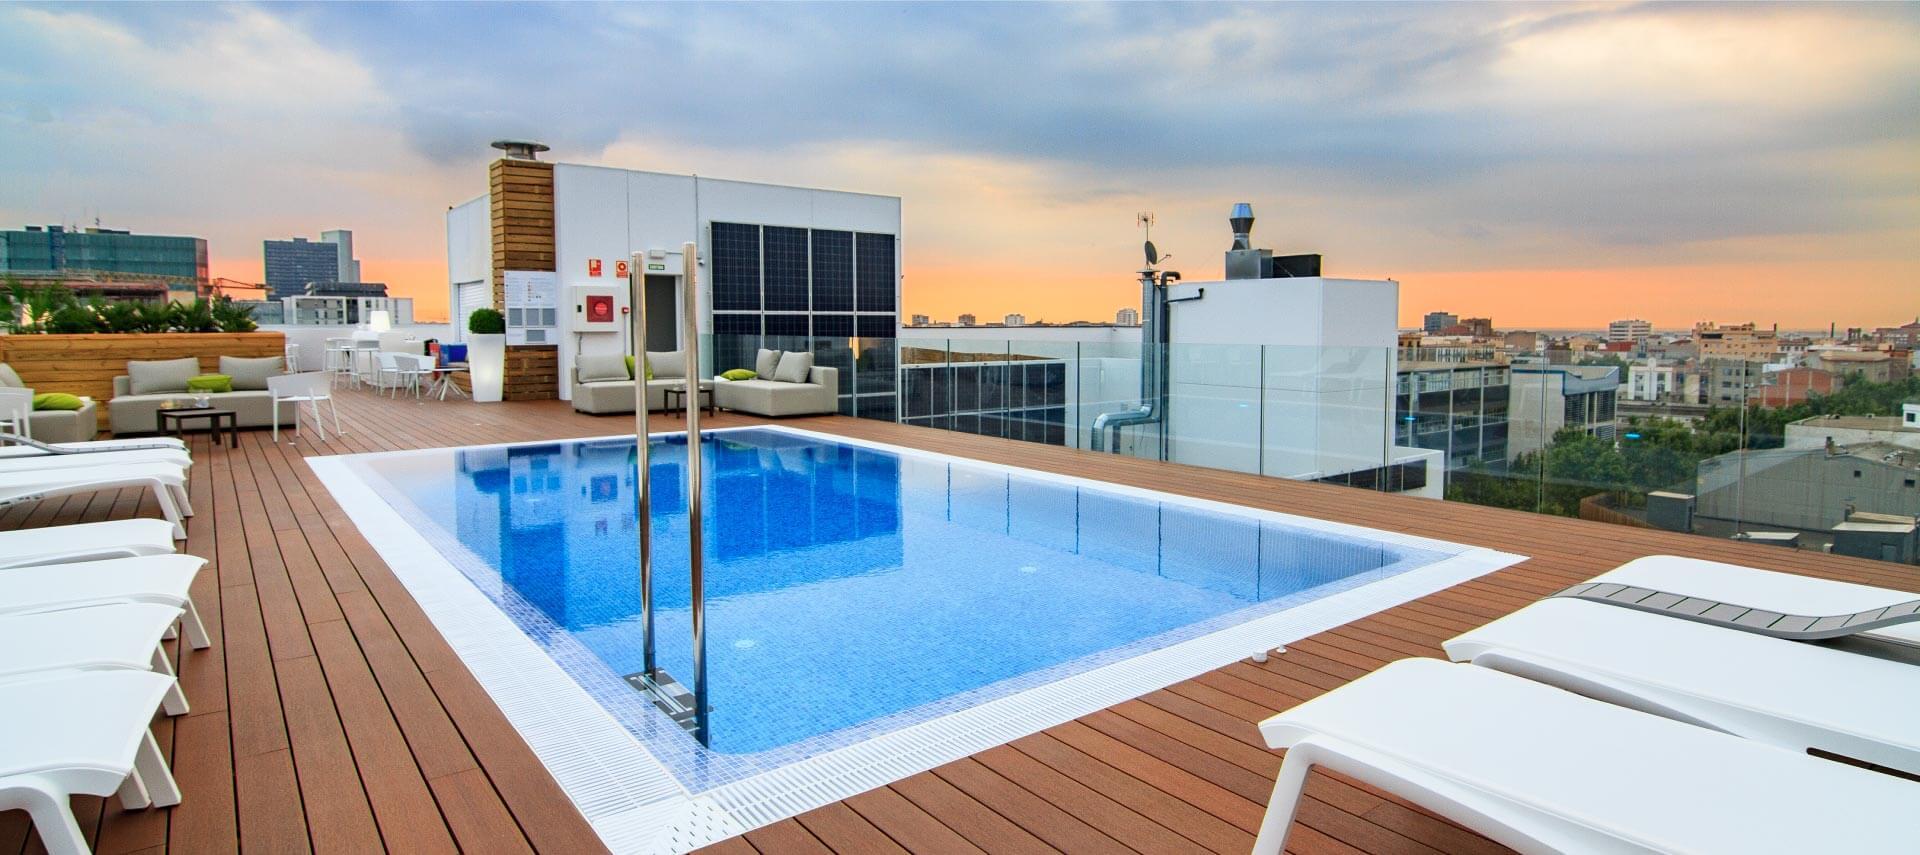 ZT The Golden Hotel Barcelona